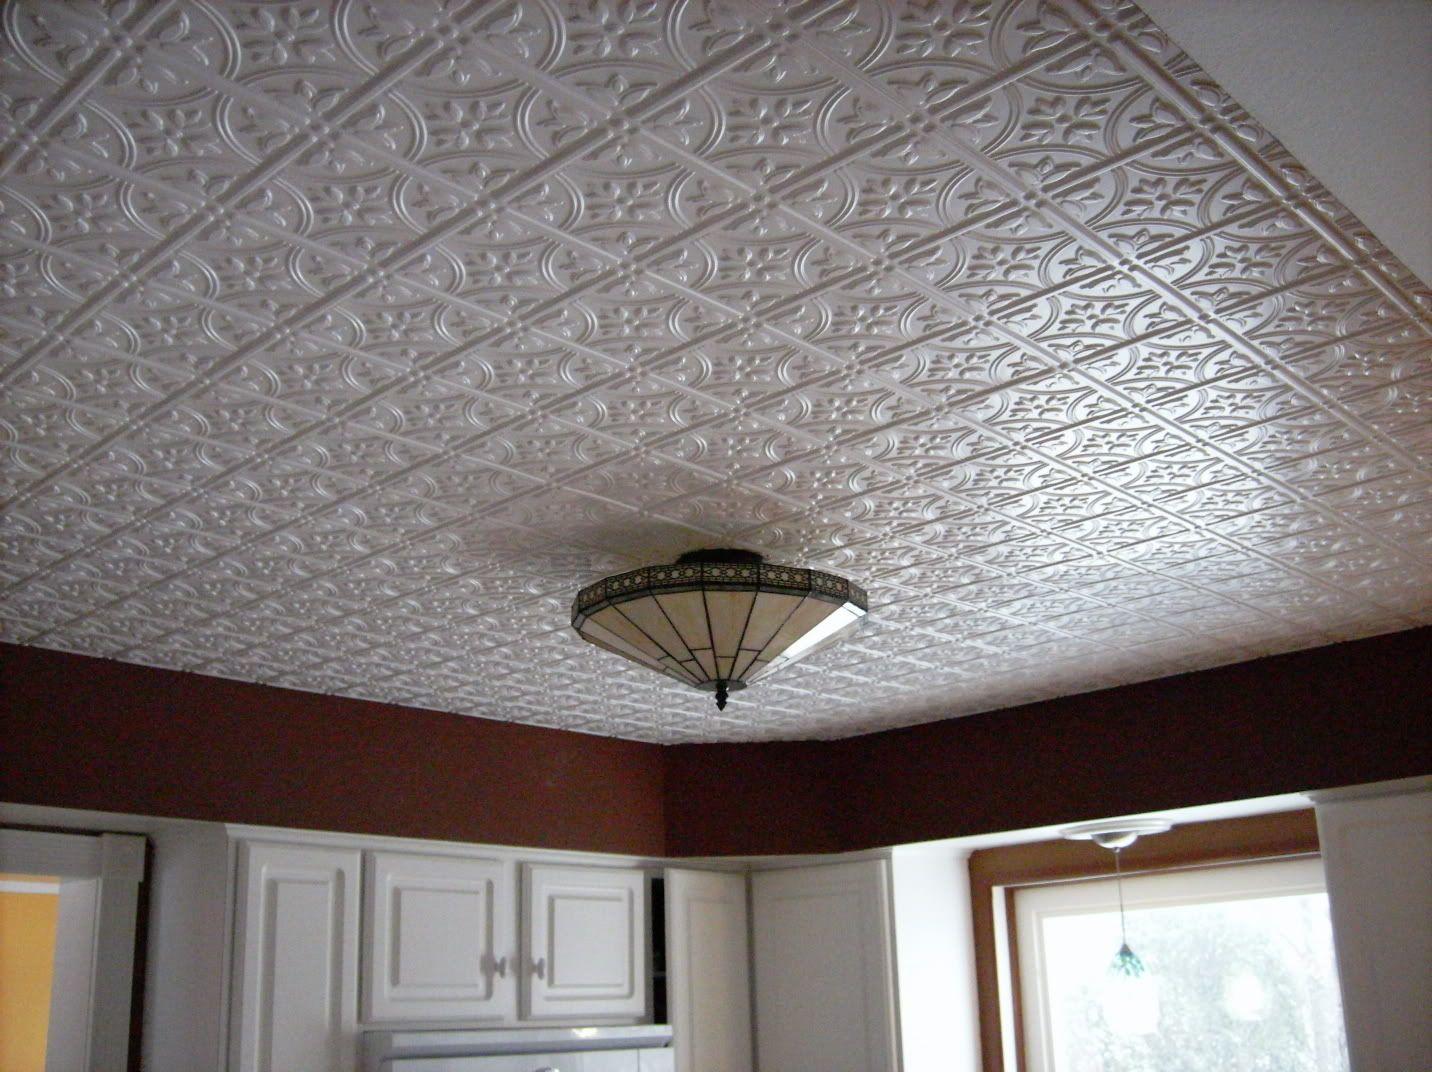 White tin ceiling tiles images tile flooring design ideas white tin ceiling tiles images tile flooring design ideas white tin ceiling tiles gallery tile flooring dailygadgetfo Choice Image